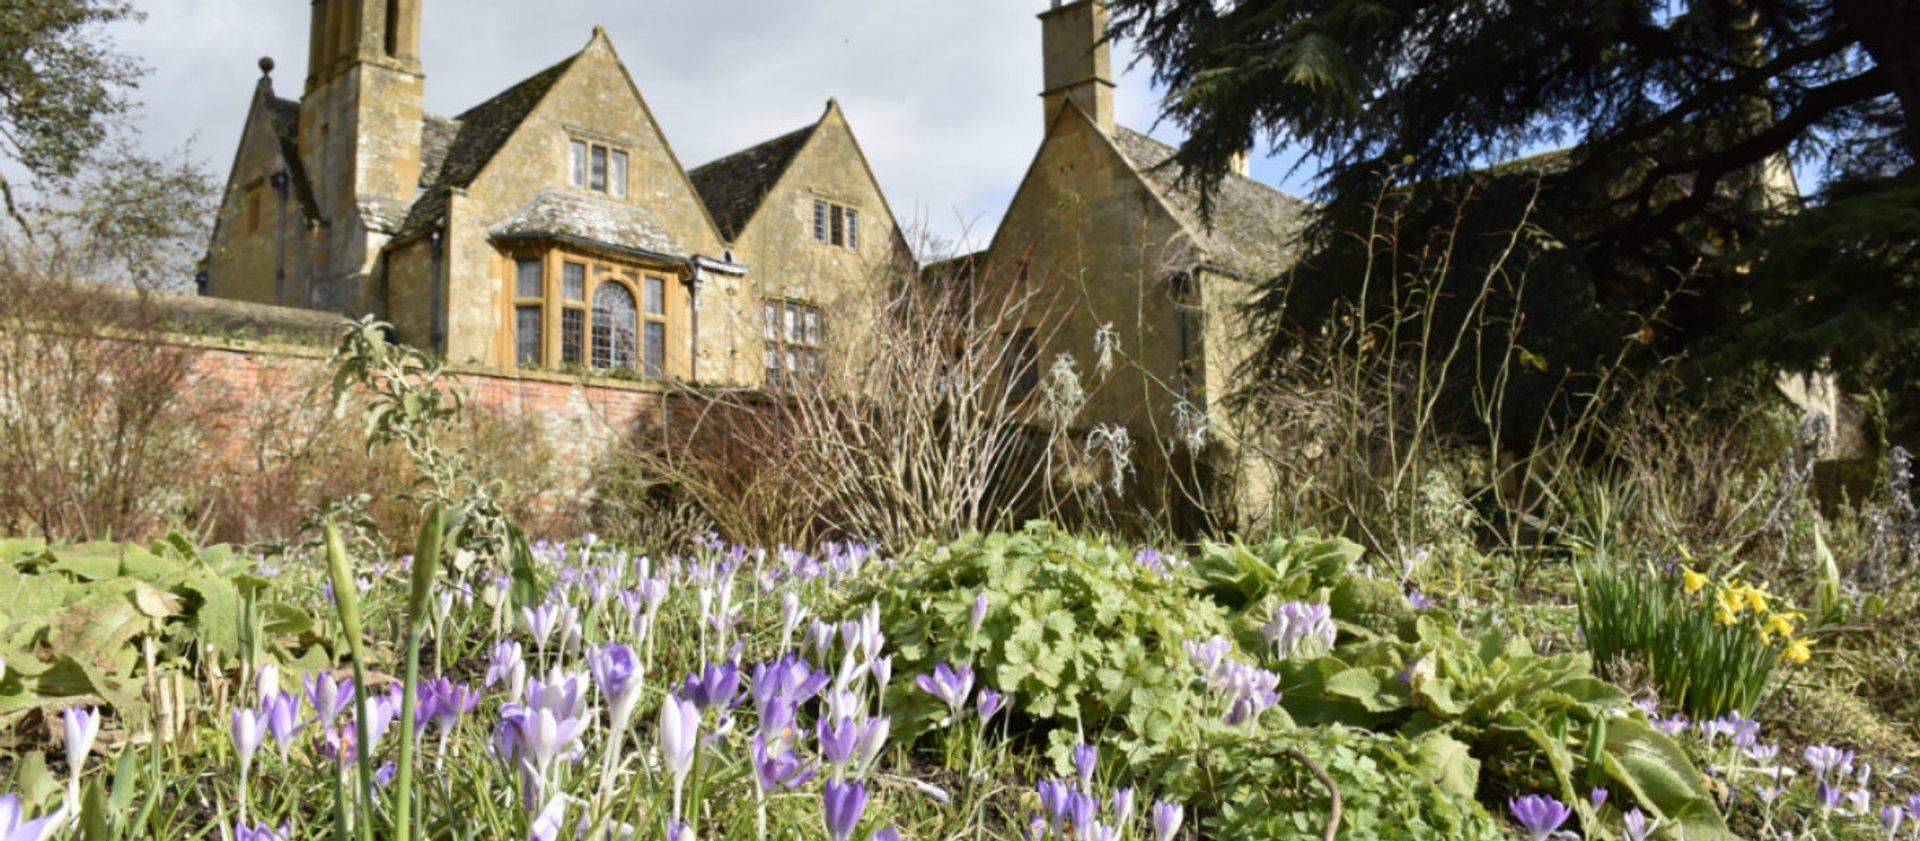 Hidcote Manor Garden for hire